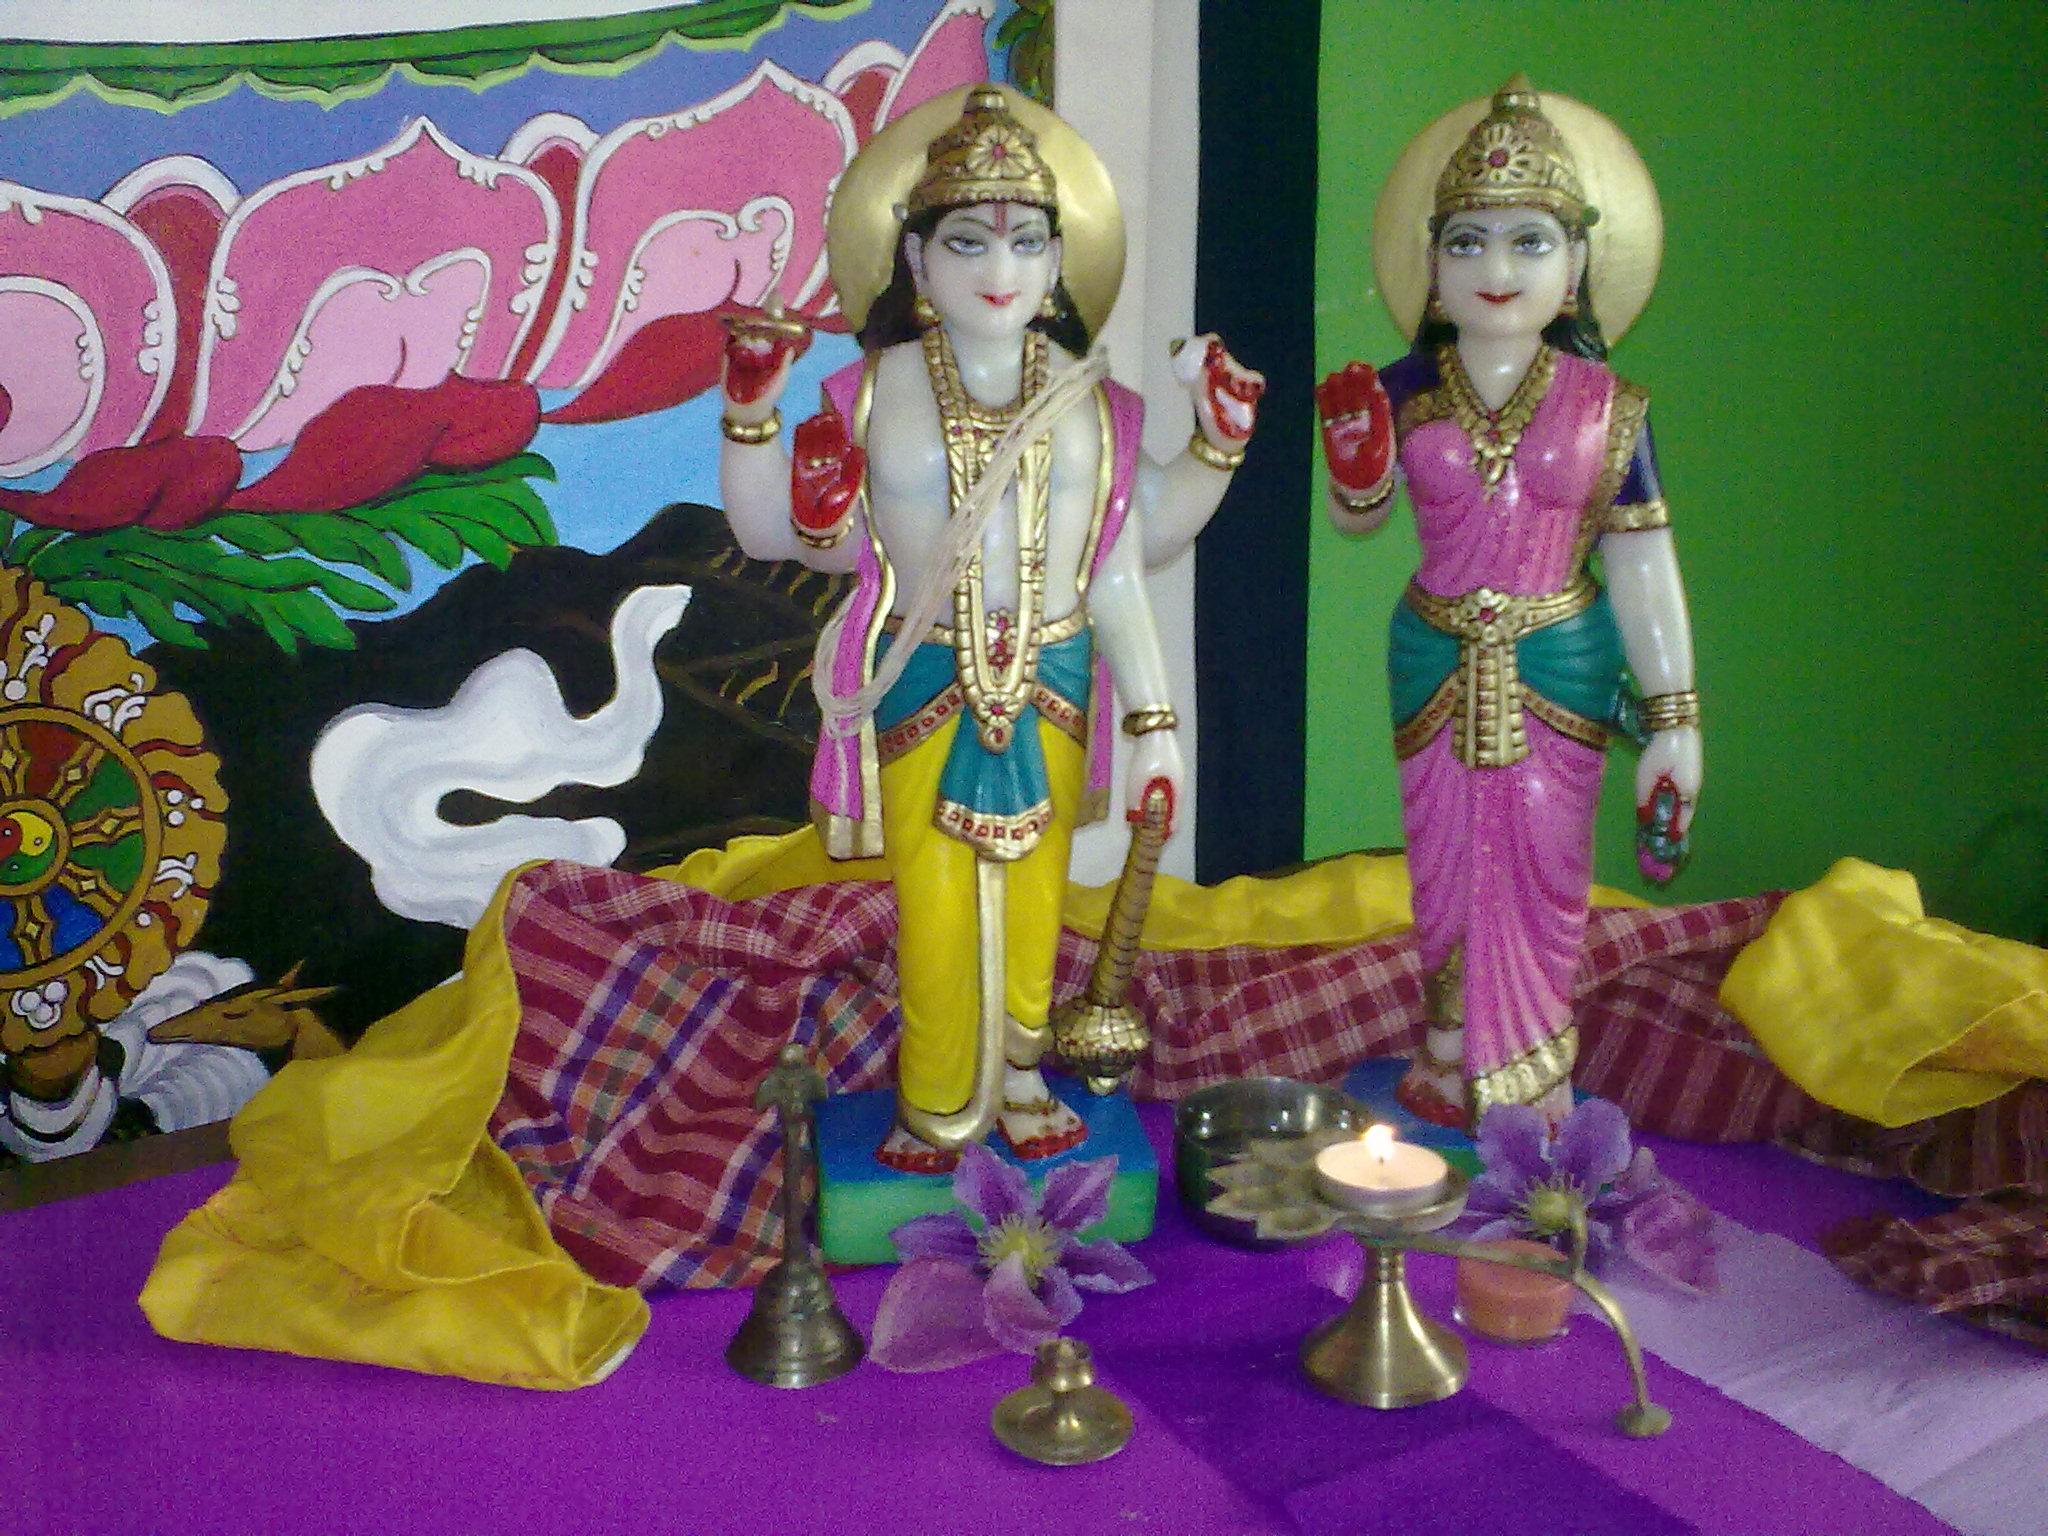 Hindu images